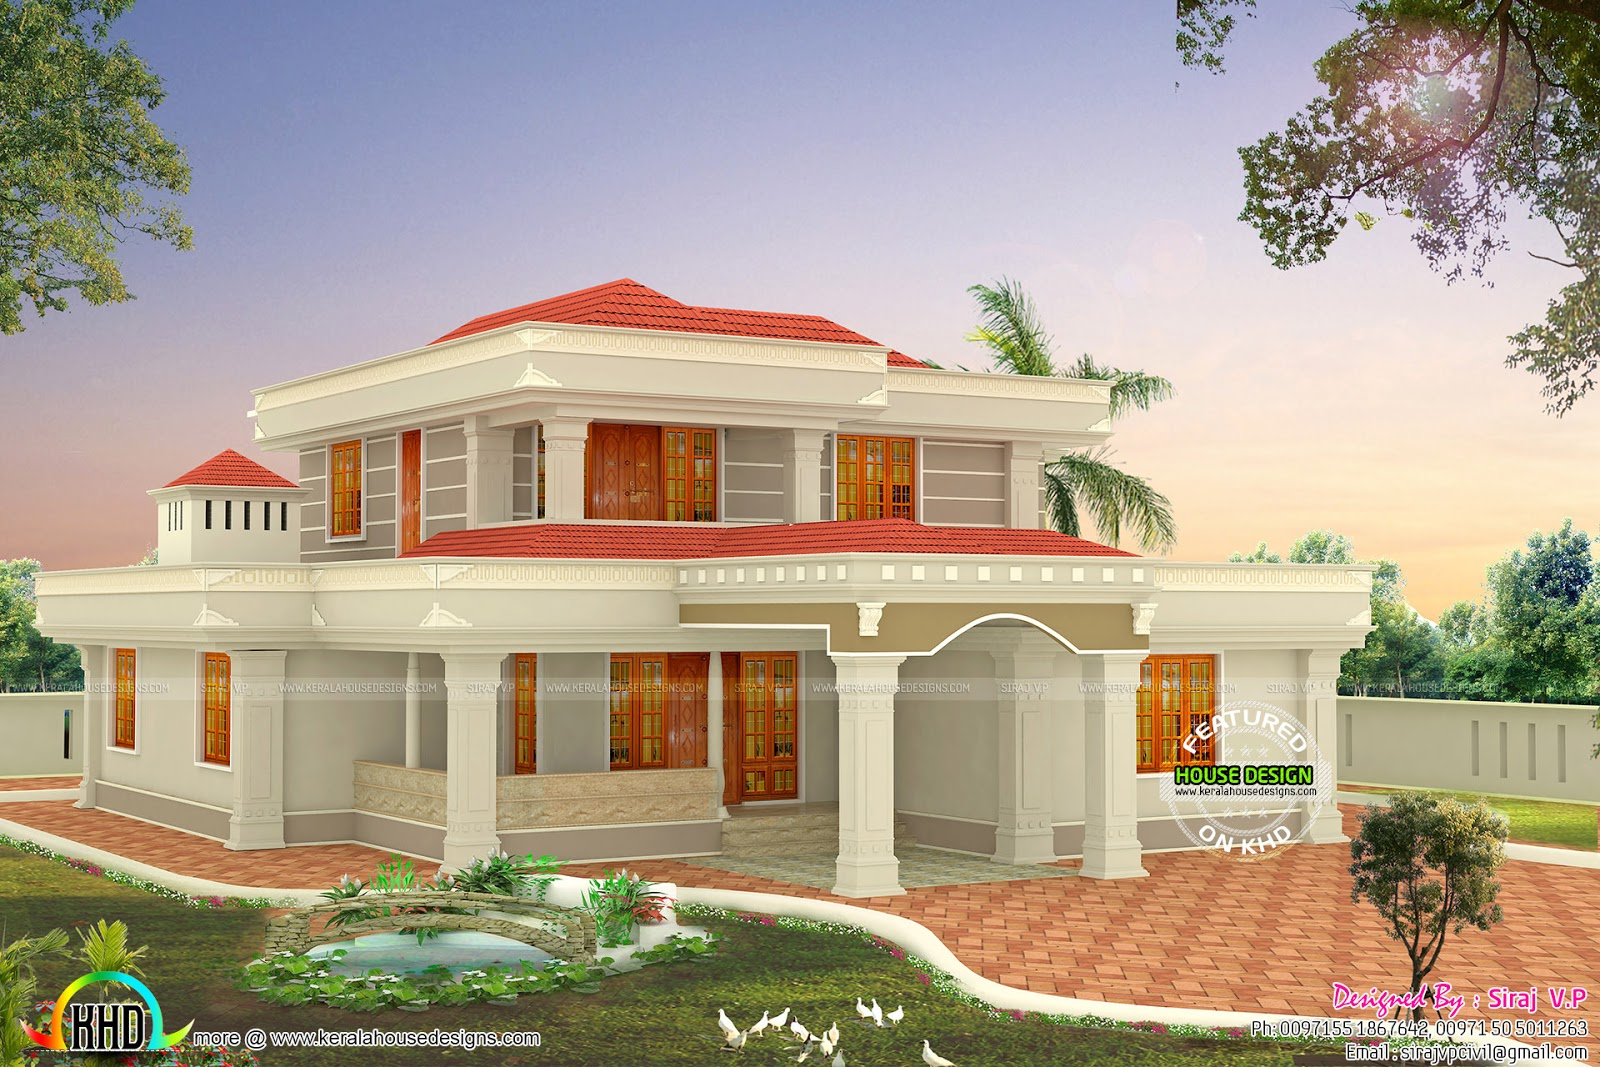 Bedroom  Sqft Modern Home Kerala Home Design Bloglovin - 5 bedroom house modern